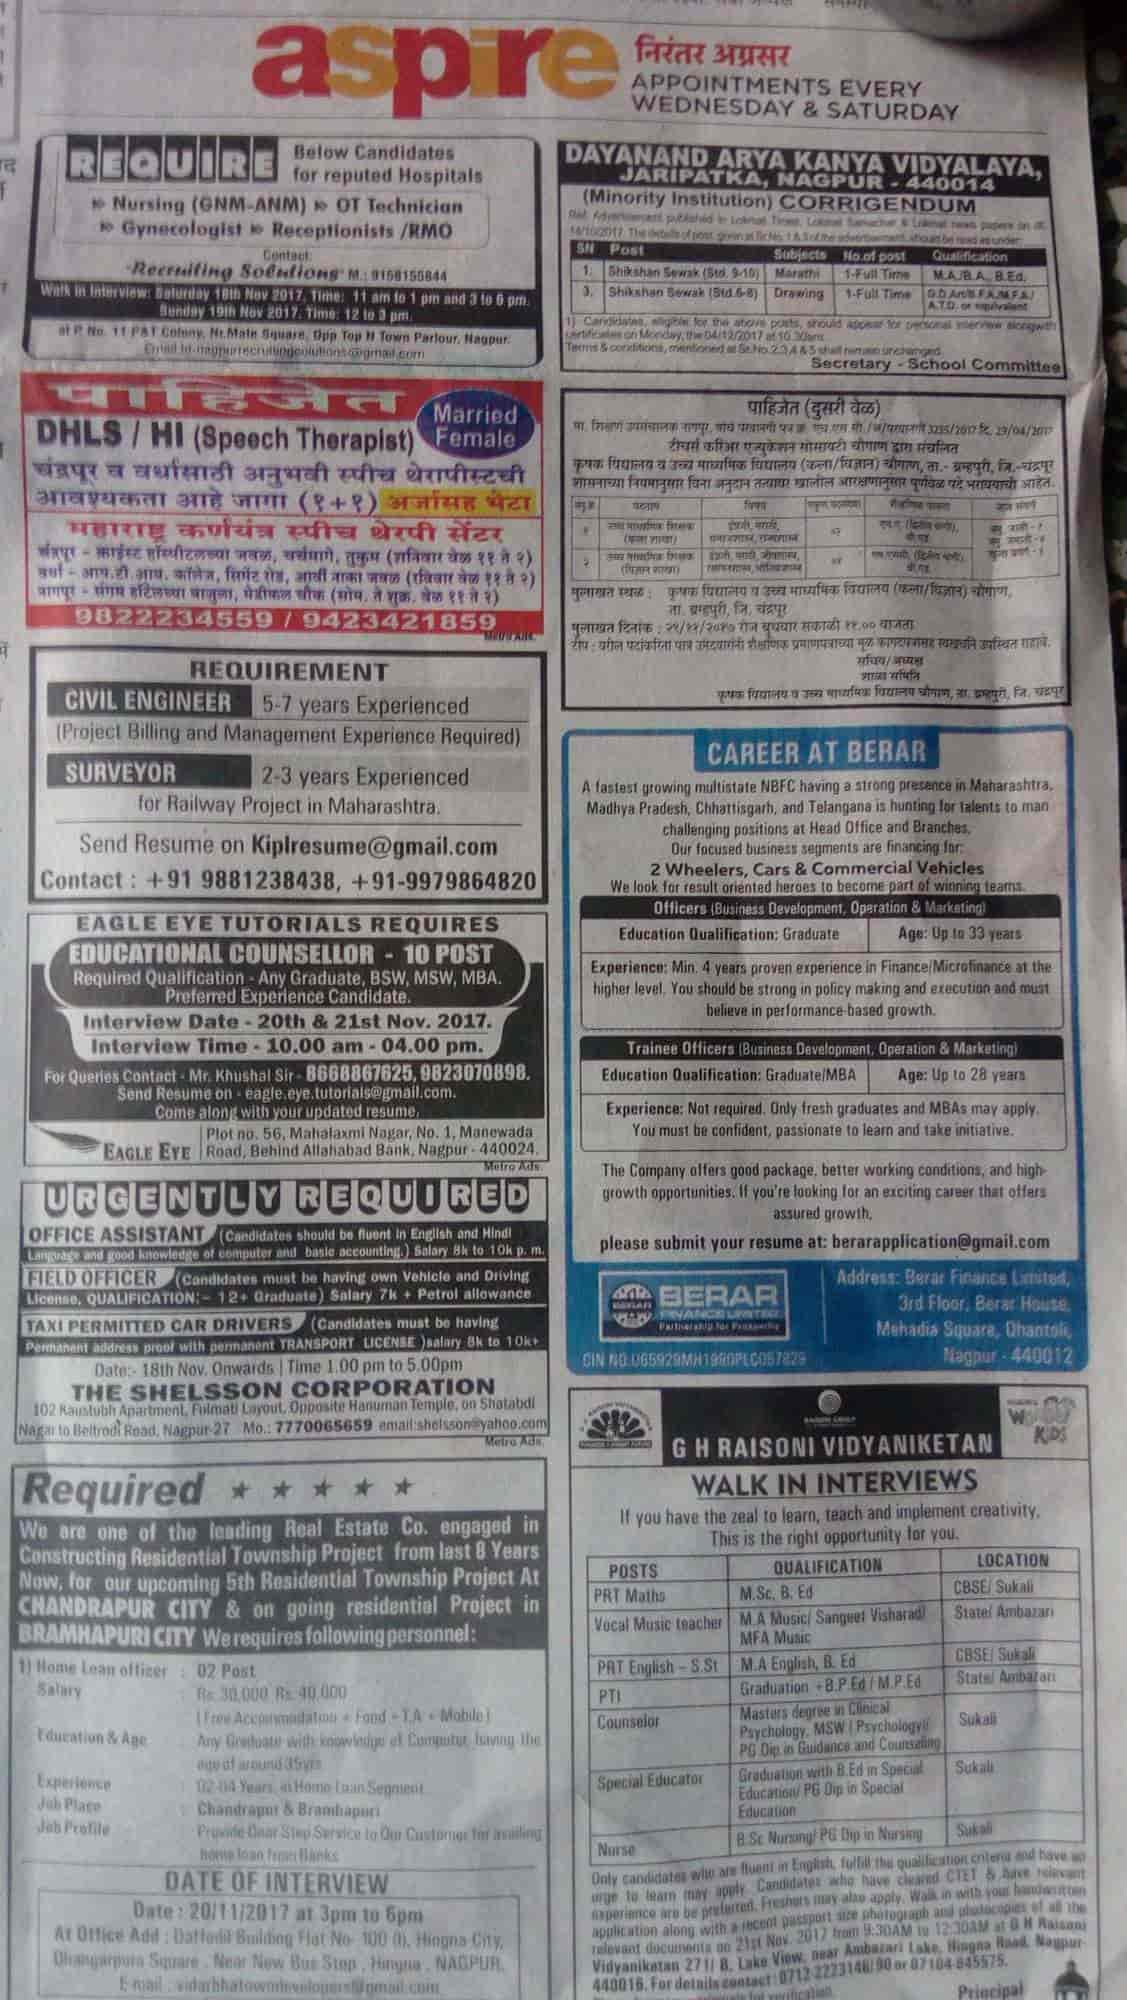 D Link Media Services, Binaki Mangalwari - Newspaper